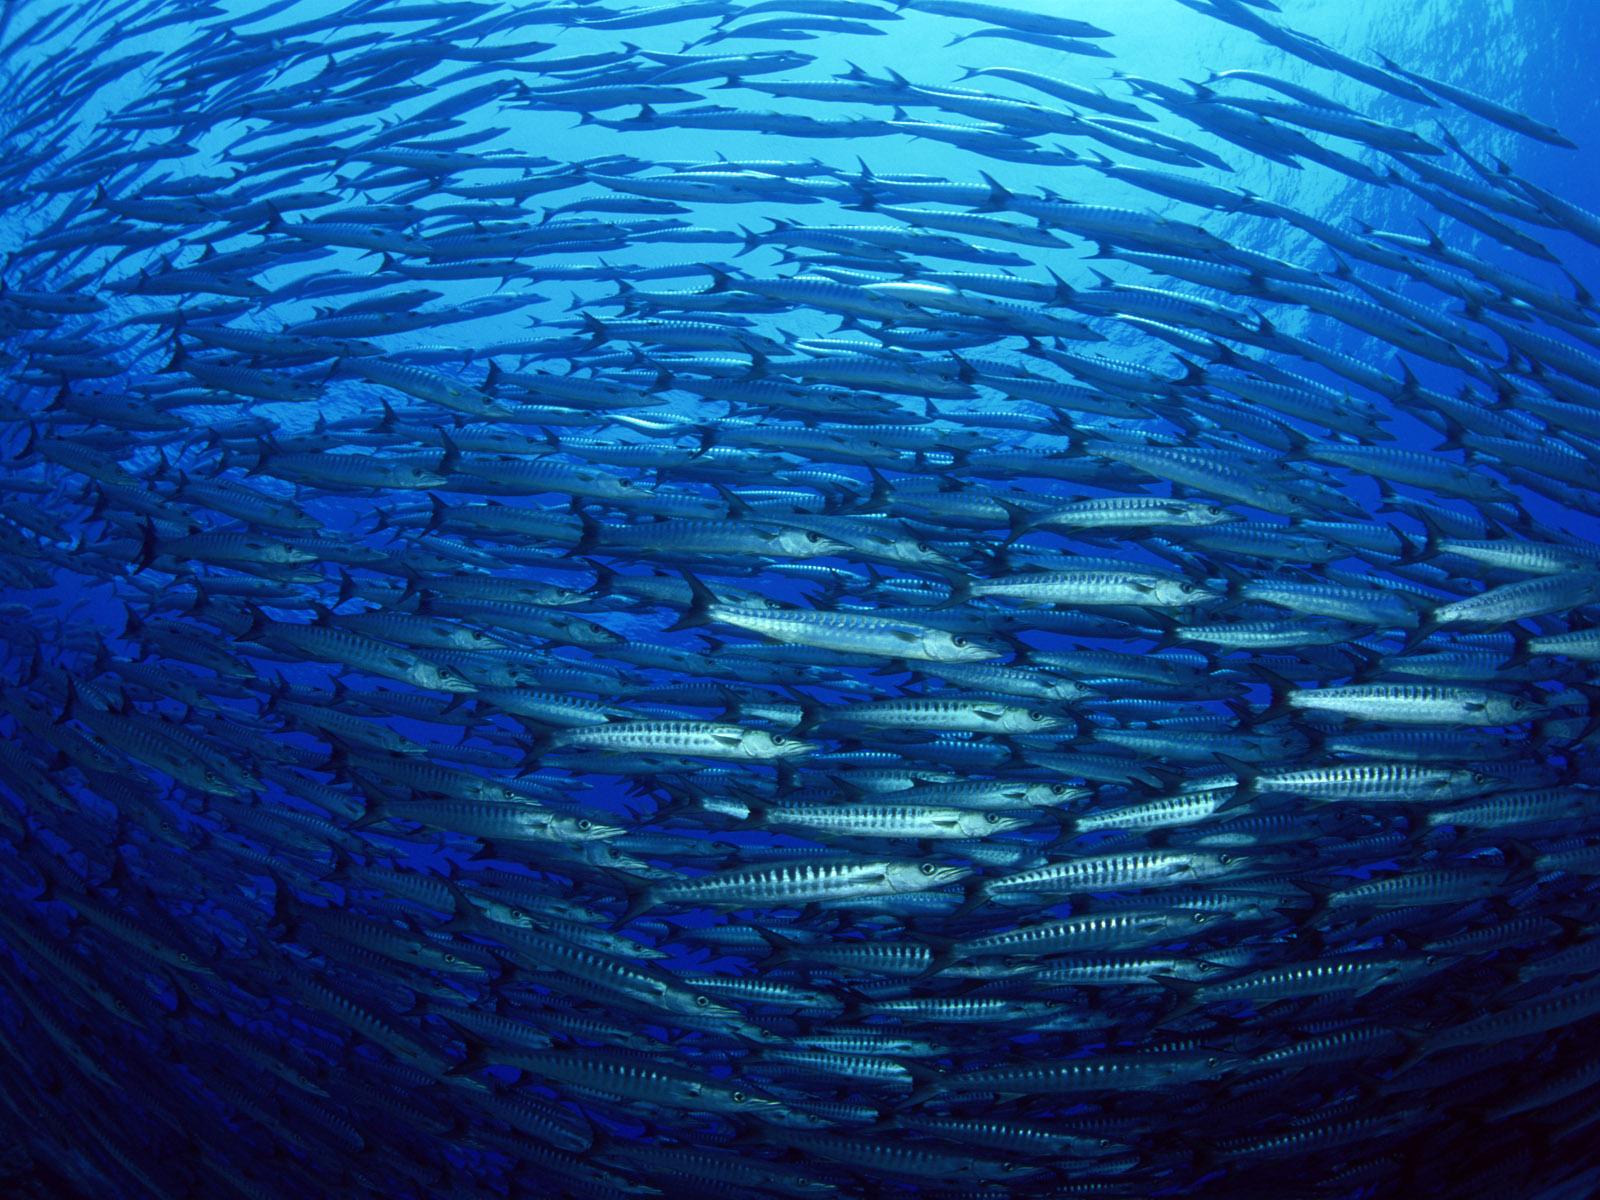 http://1.bp.blogspot.com/-SOeD9Qep64A/TkrX6OQiYwI/AAAAAAAALl4/CvDkDlk0Tr0/s1600/Underwater+Wallpapers+%252842%2529.jpg